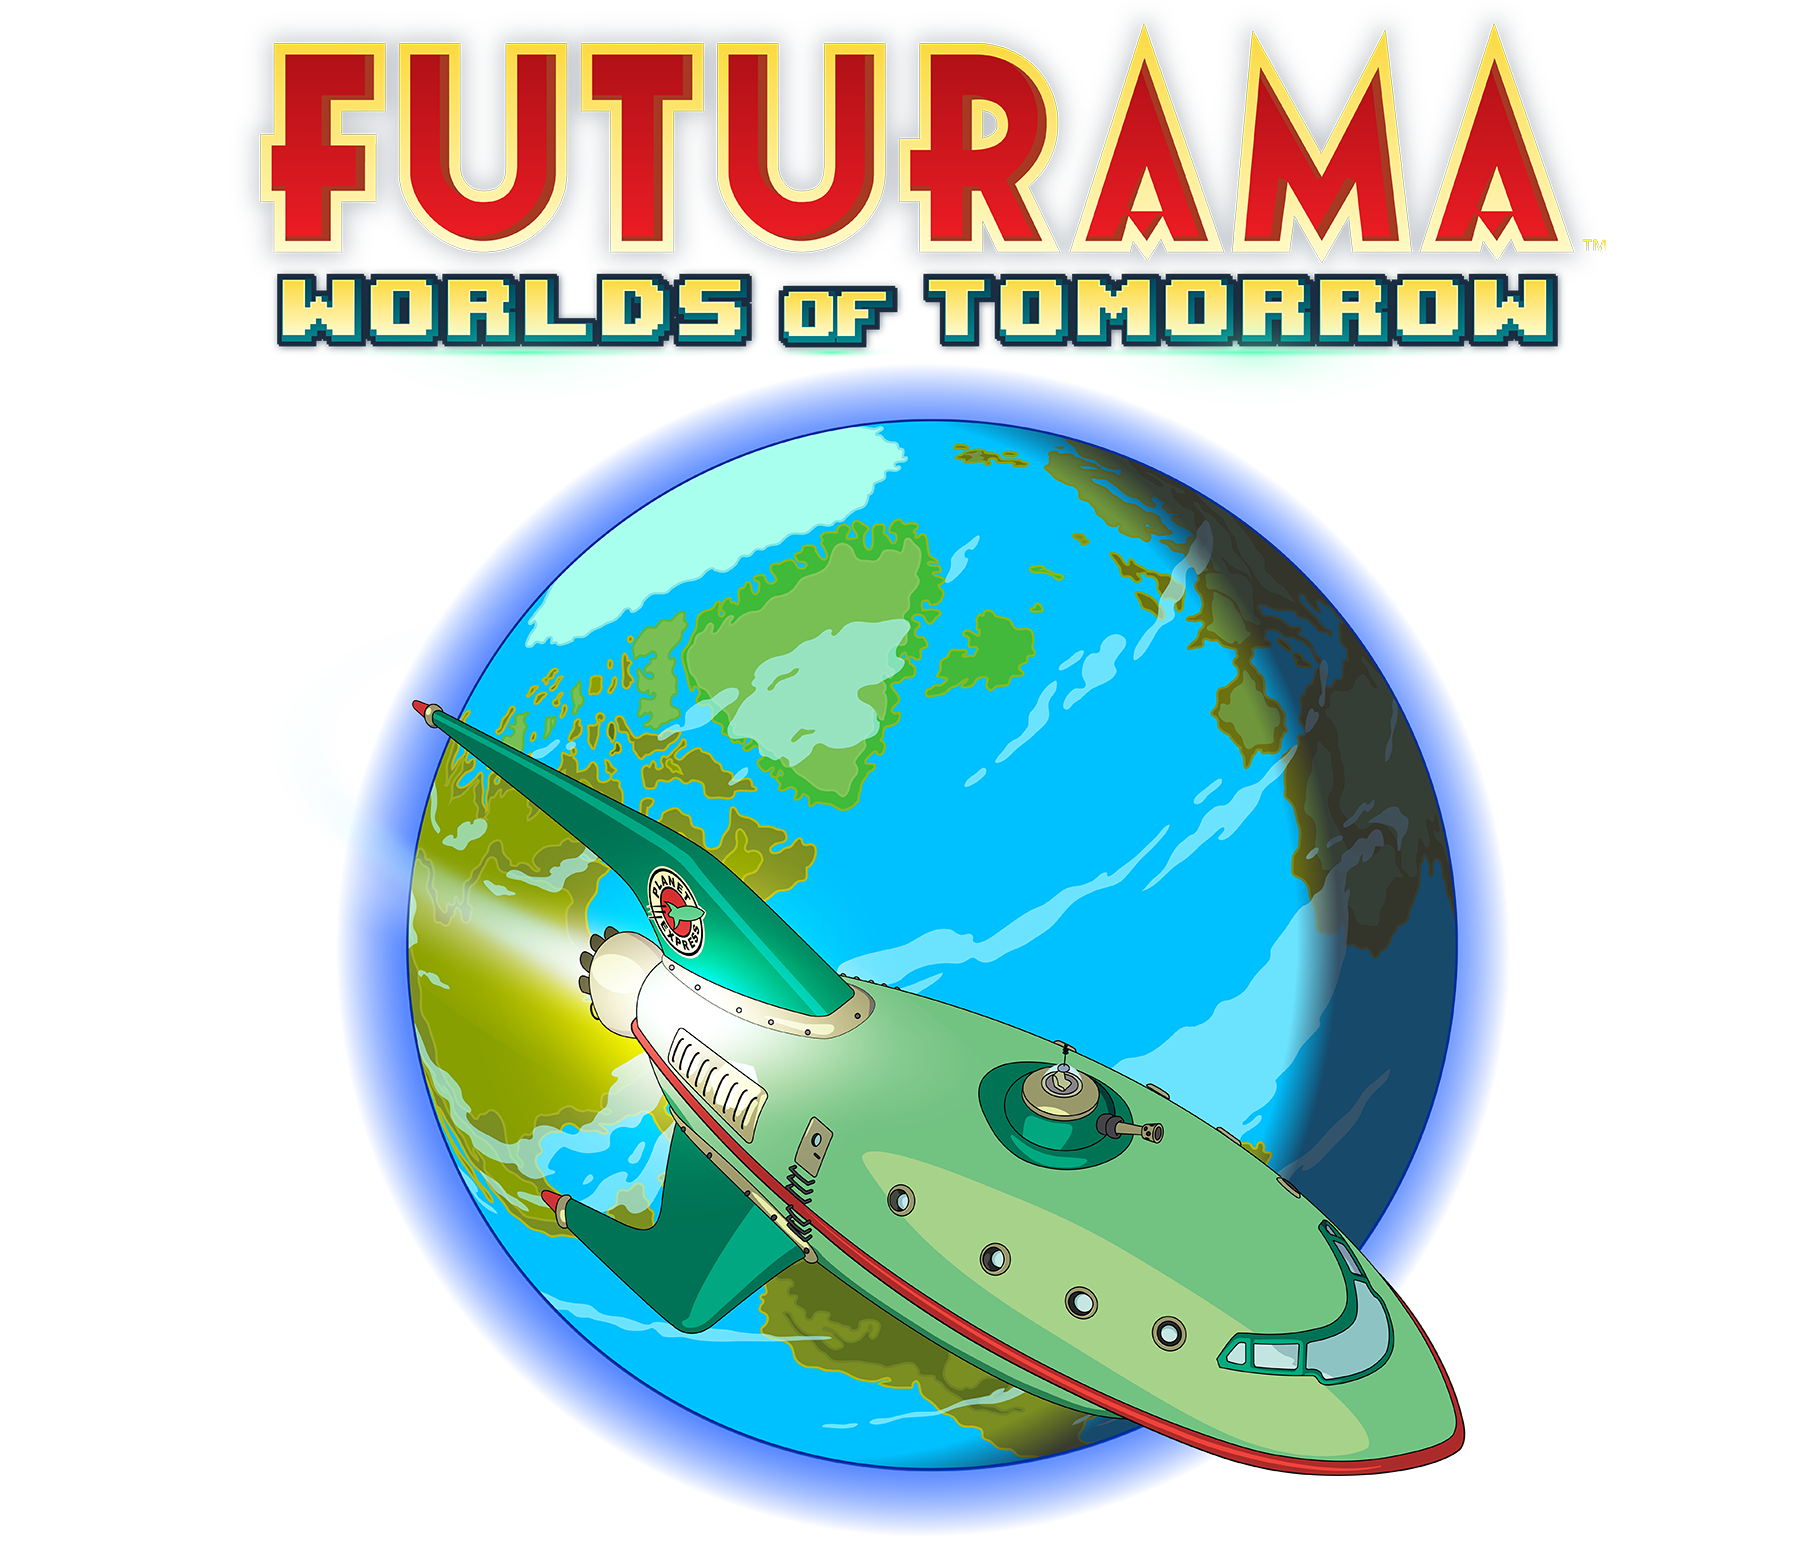 Futurama: Worlds of Tomorrow is looking pretty good.